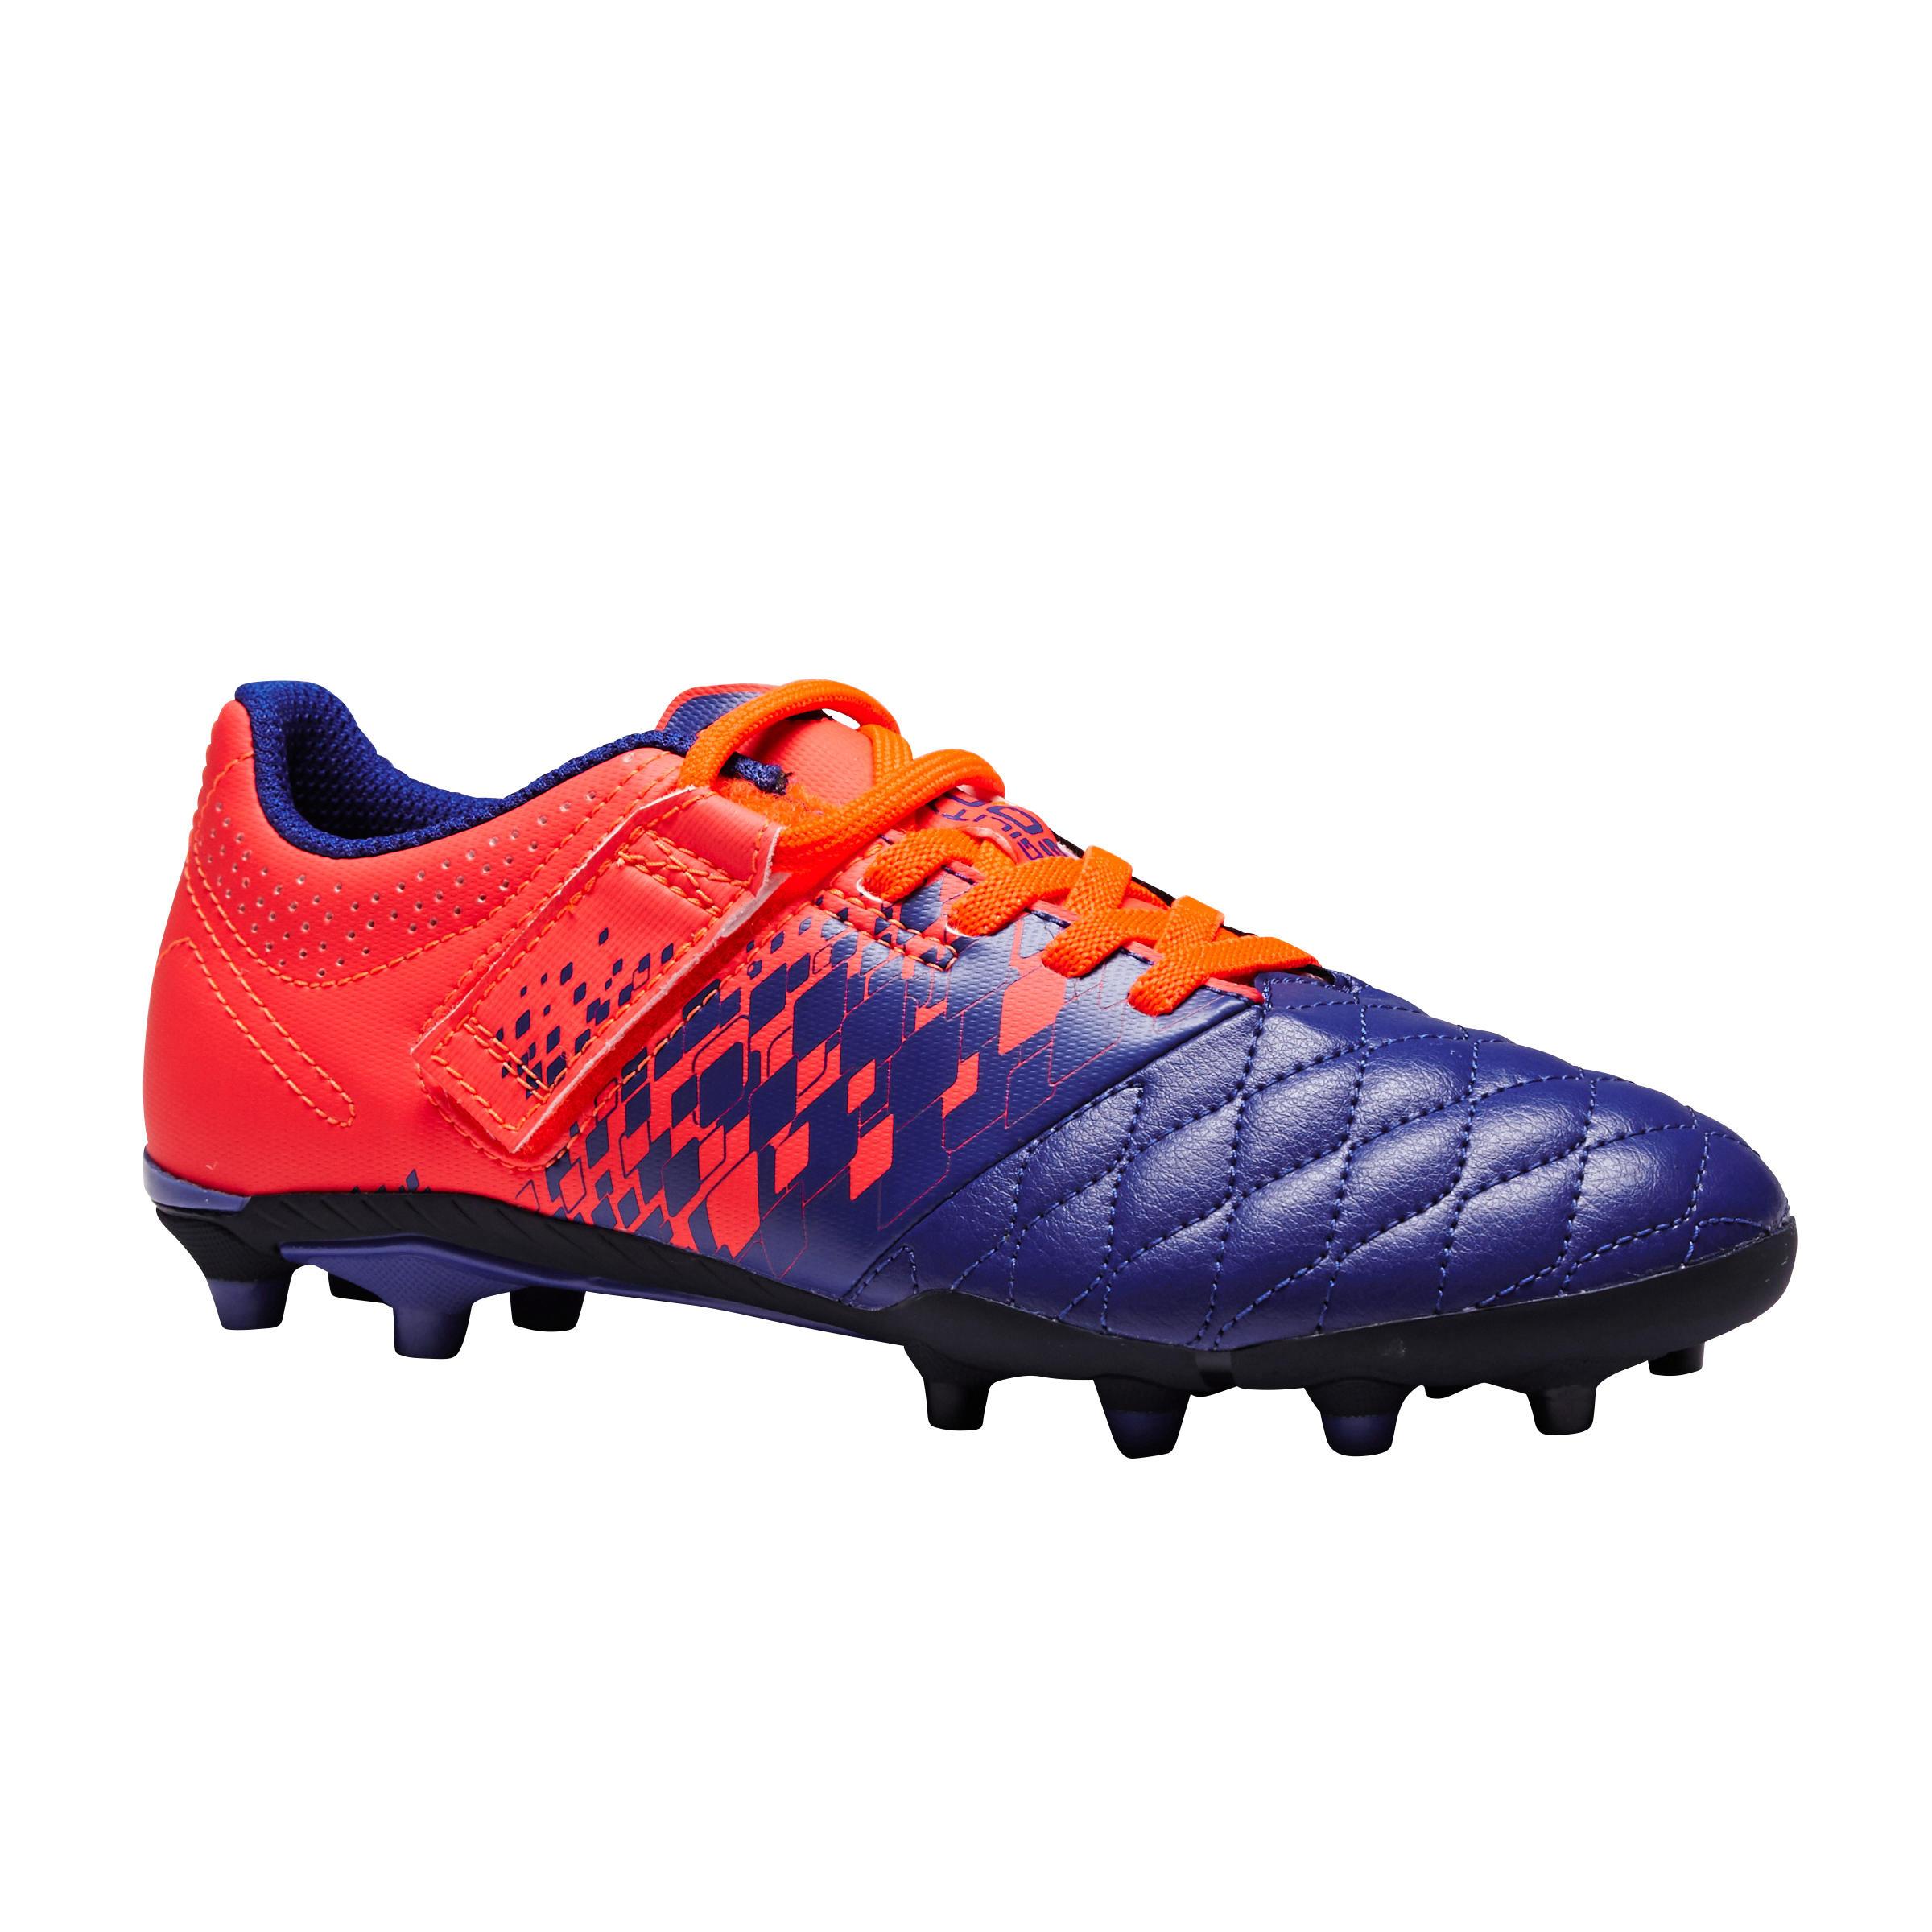 Kipsta Voetbalschoenen kind Agility 500 FG klittenband paars/oranje